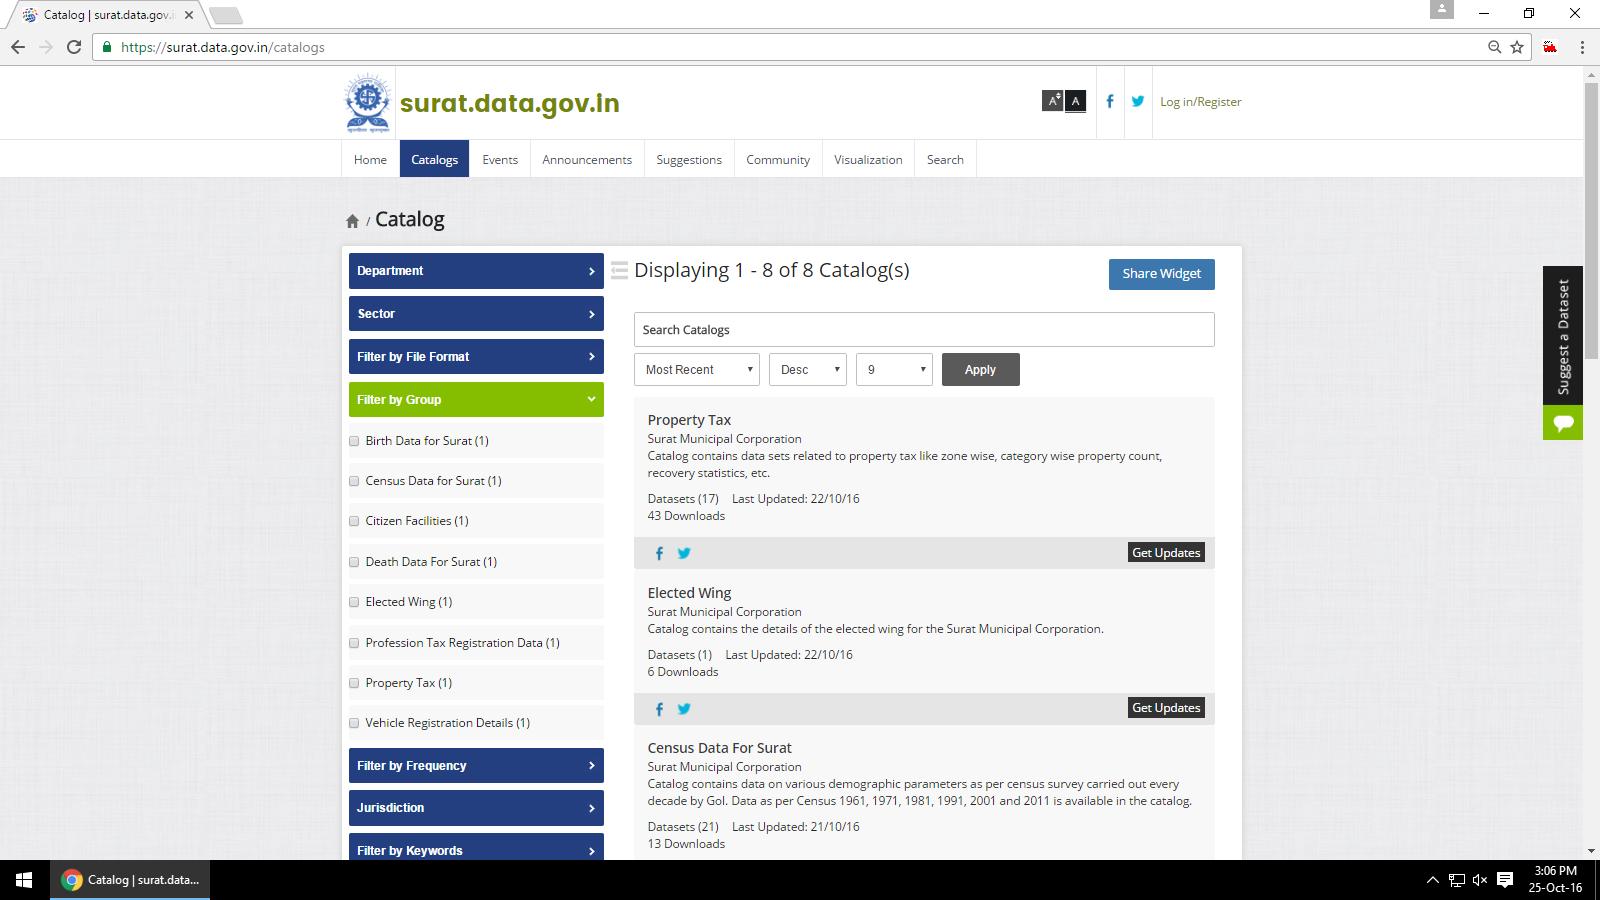 Surat Data Portal Catalogs